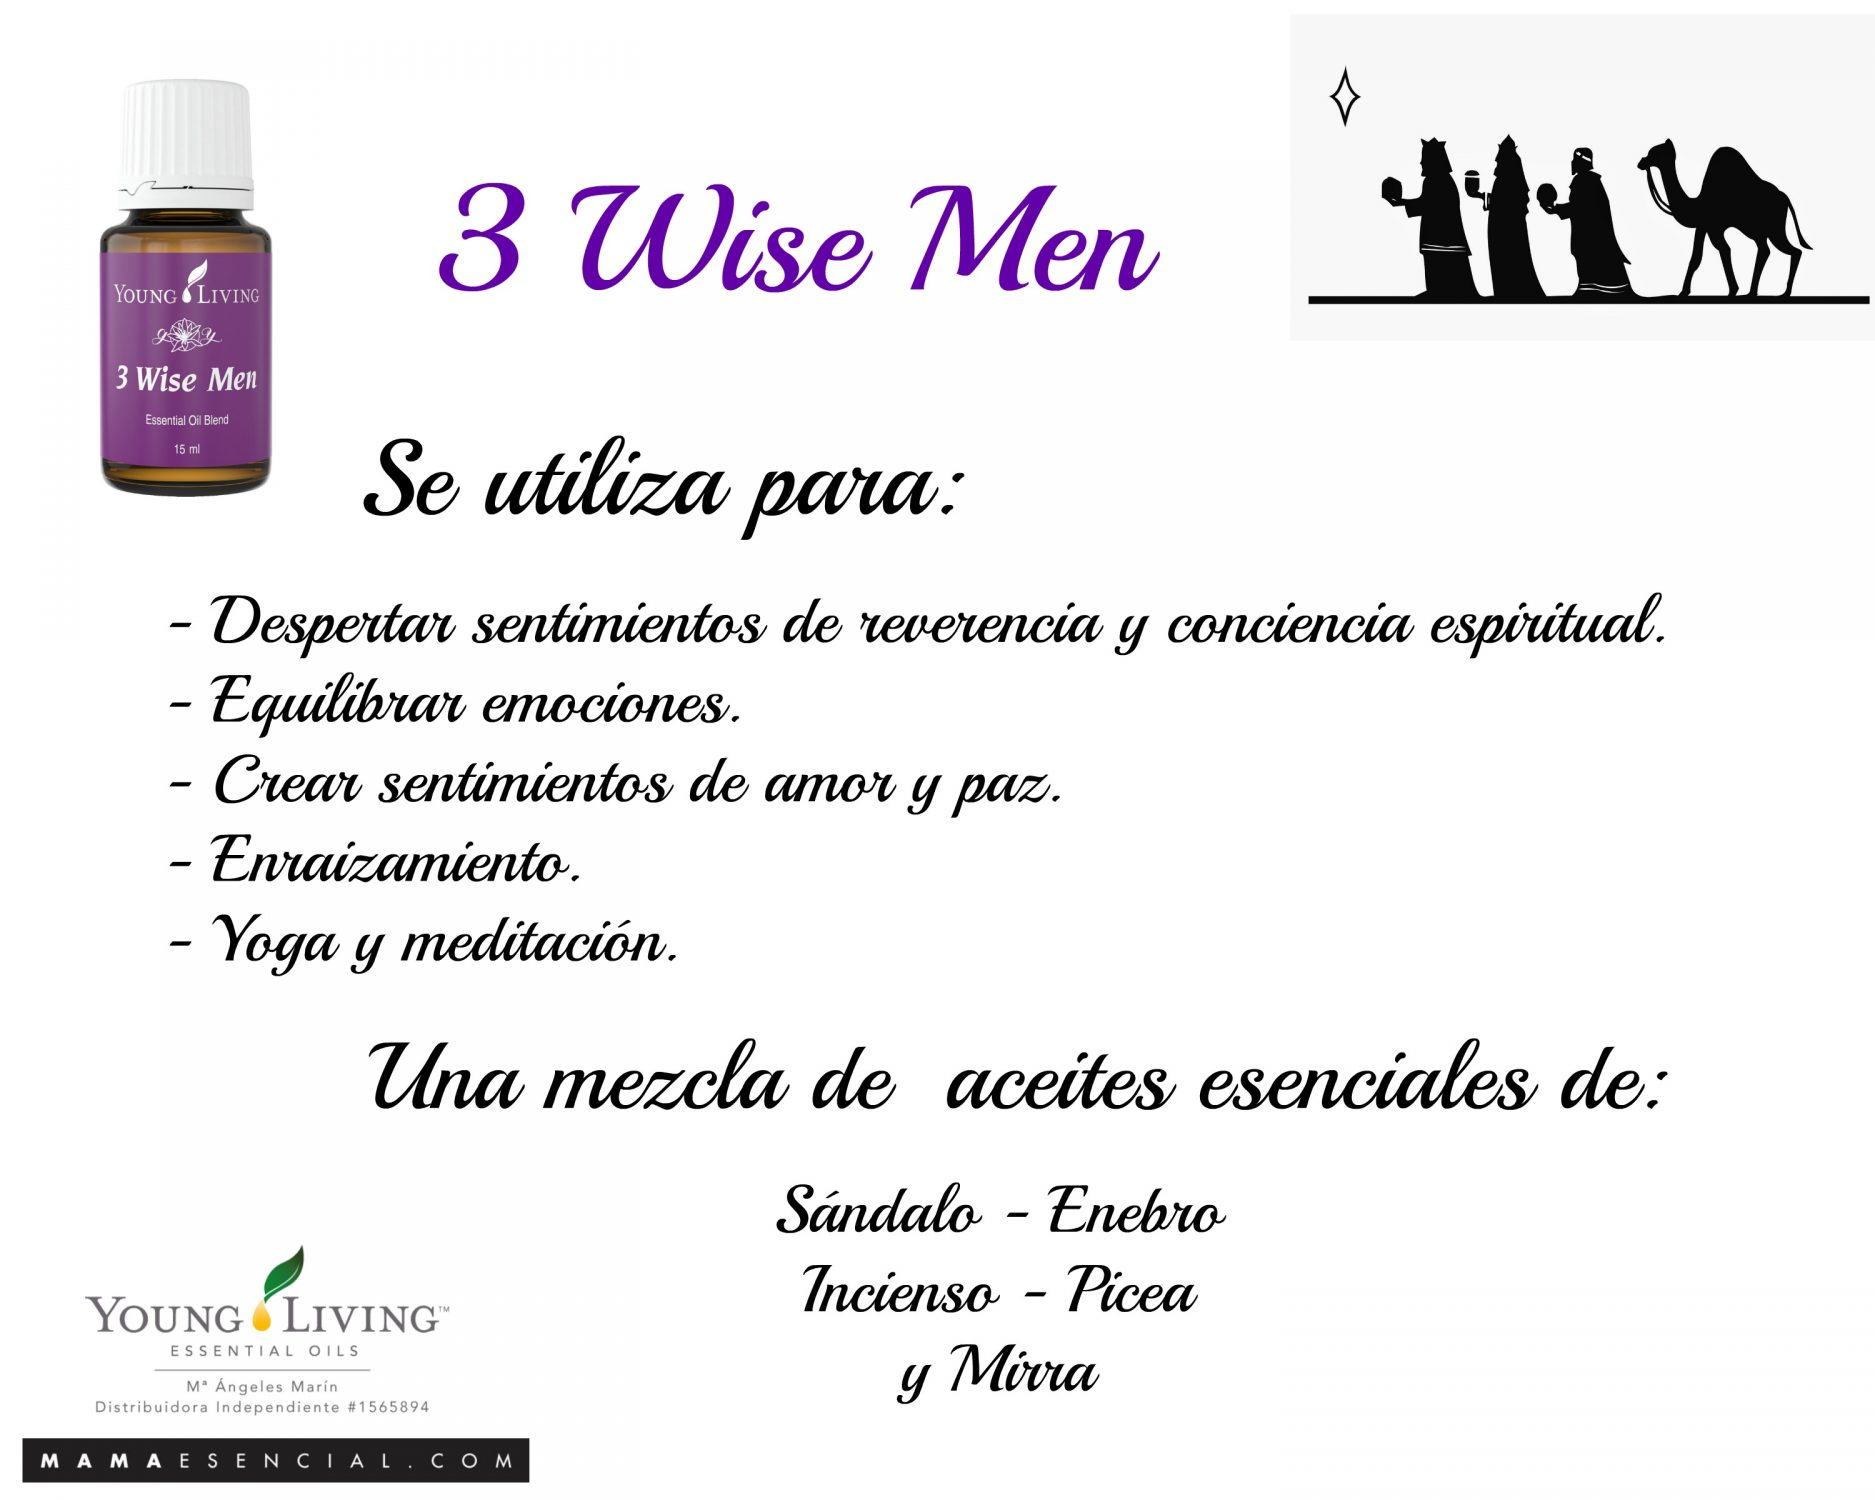 MEZCLA ACEITES ESENCIALES 3 WISE MEN